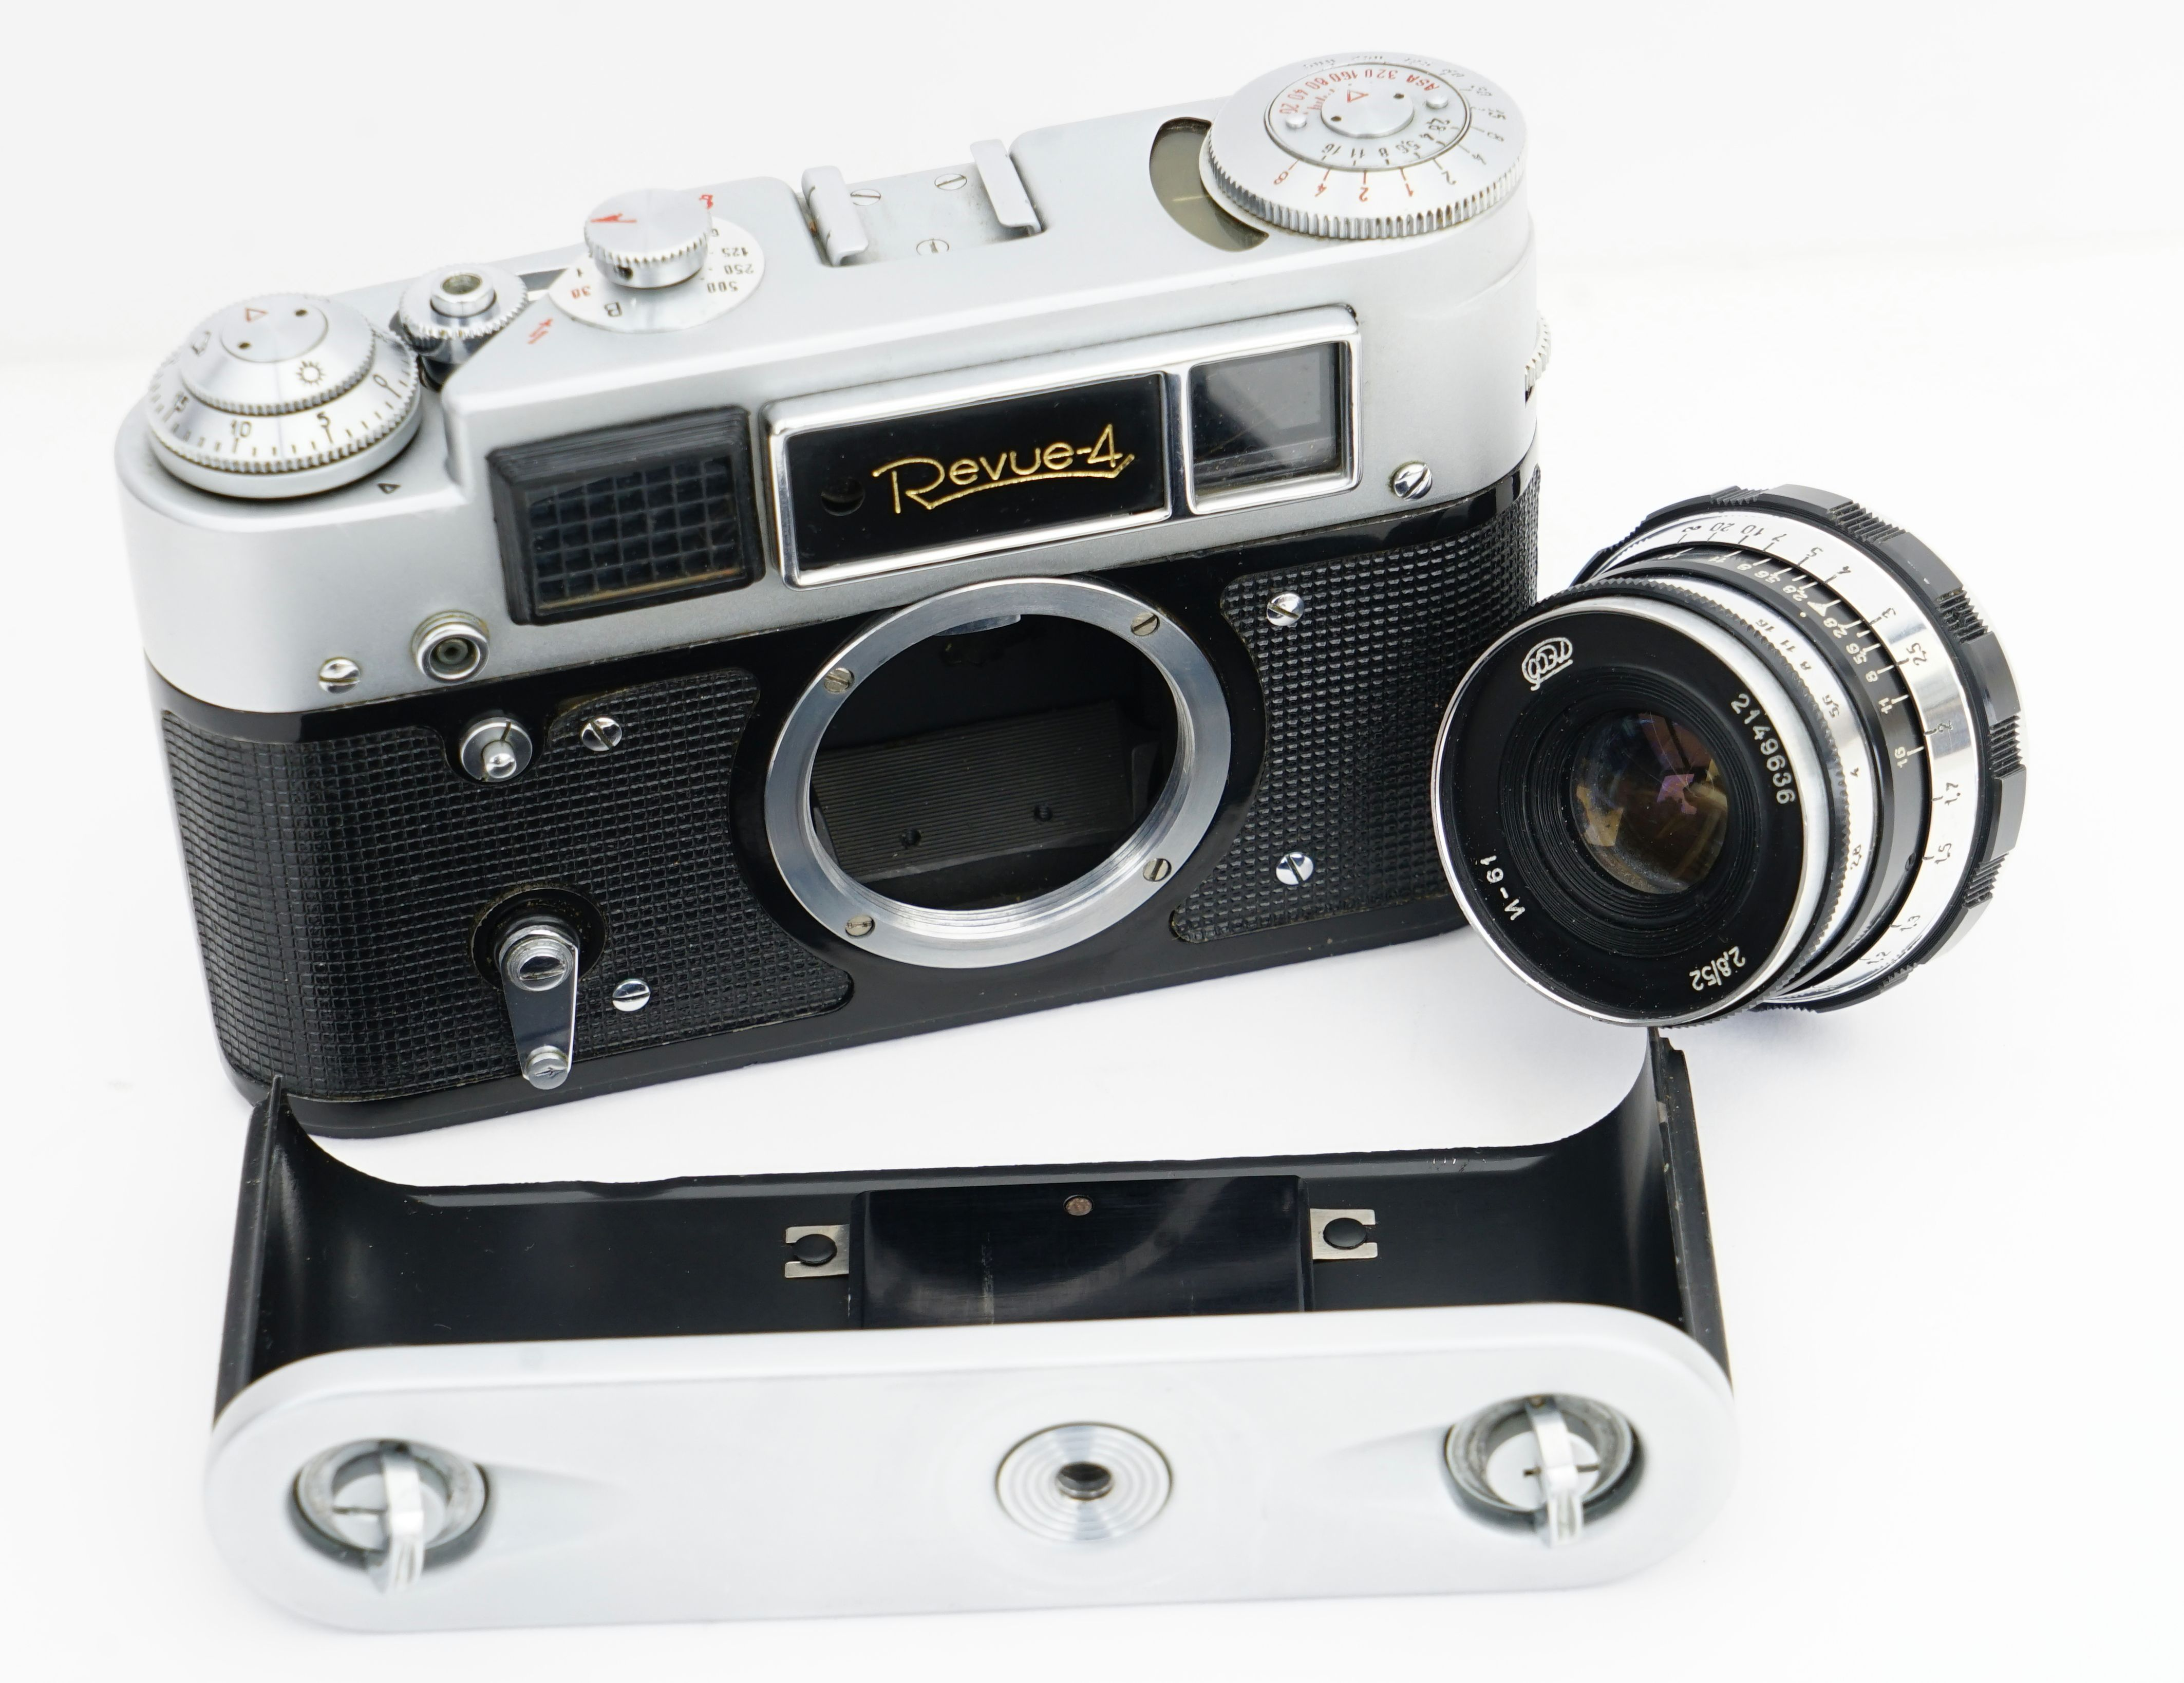 Revue 4 Versie 1 Fed 4b Lens De Industar N 61 L D 52mm F 2 8